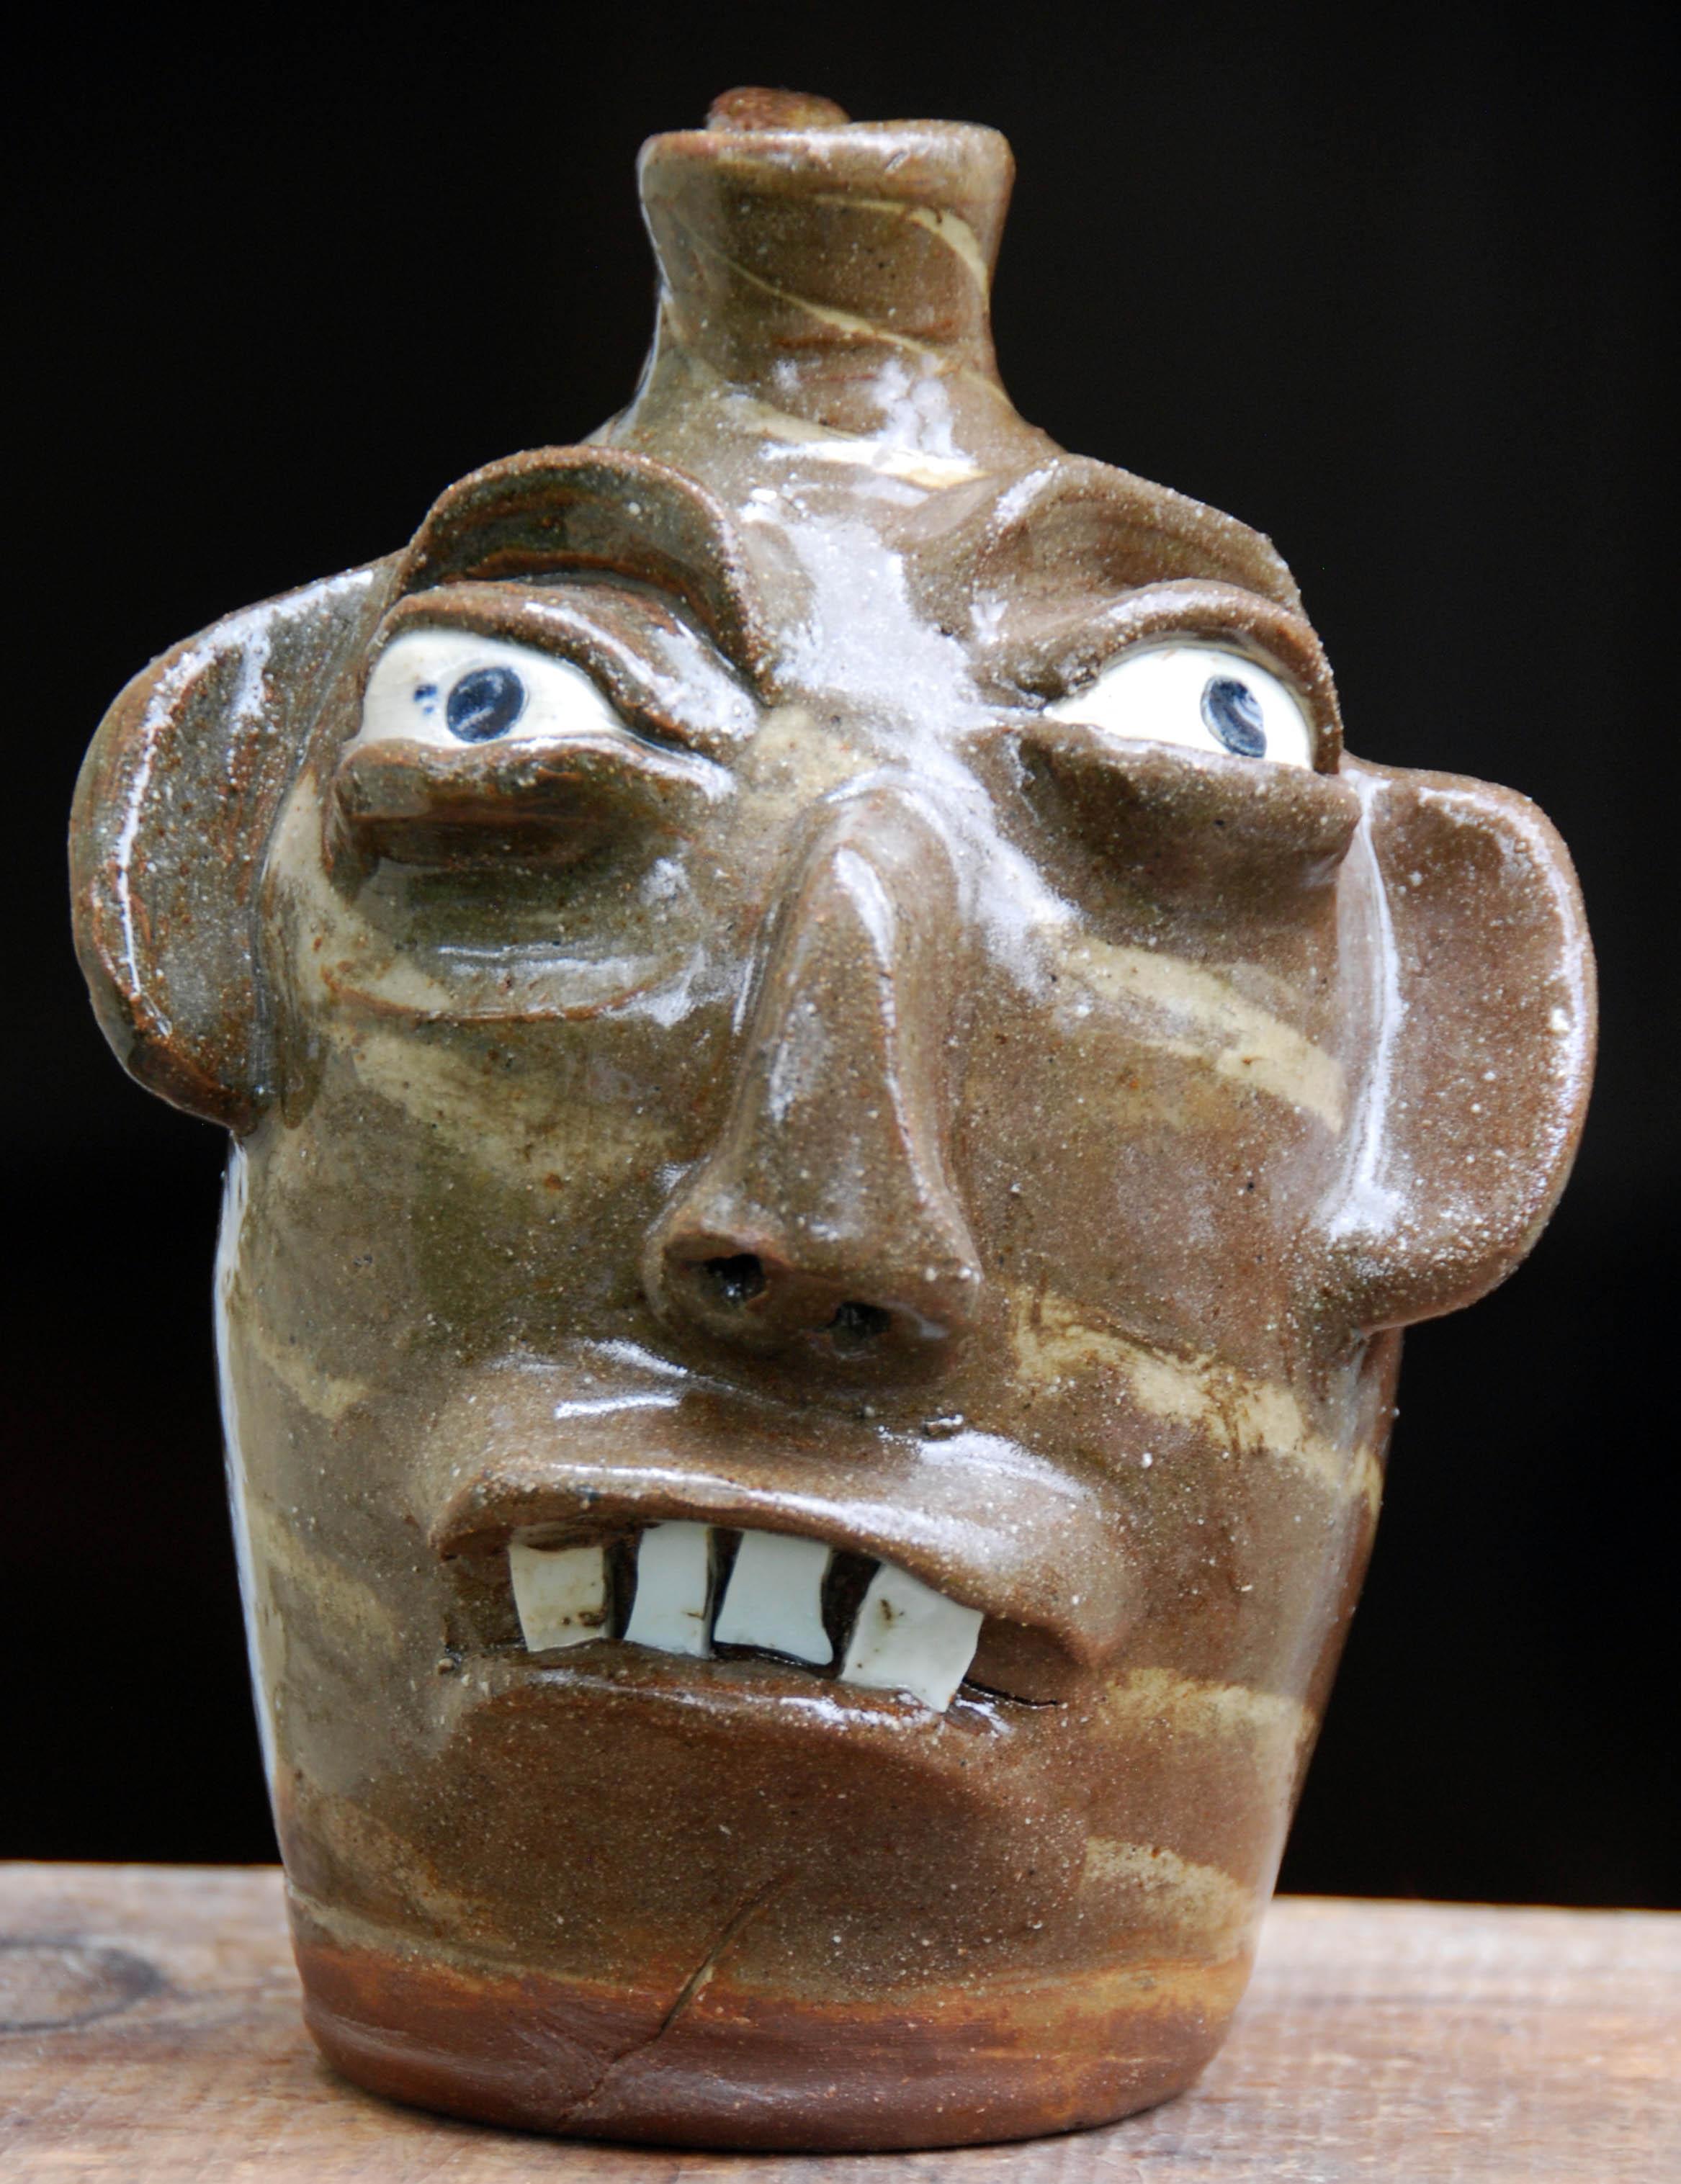 B.B. Craig - Swirl Face Jug - 8 inches